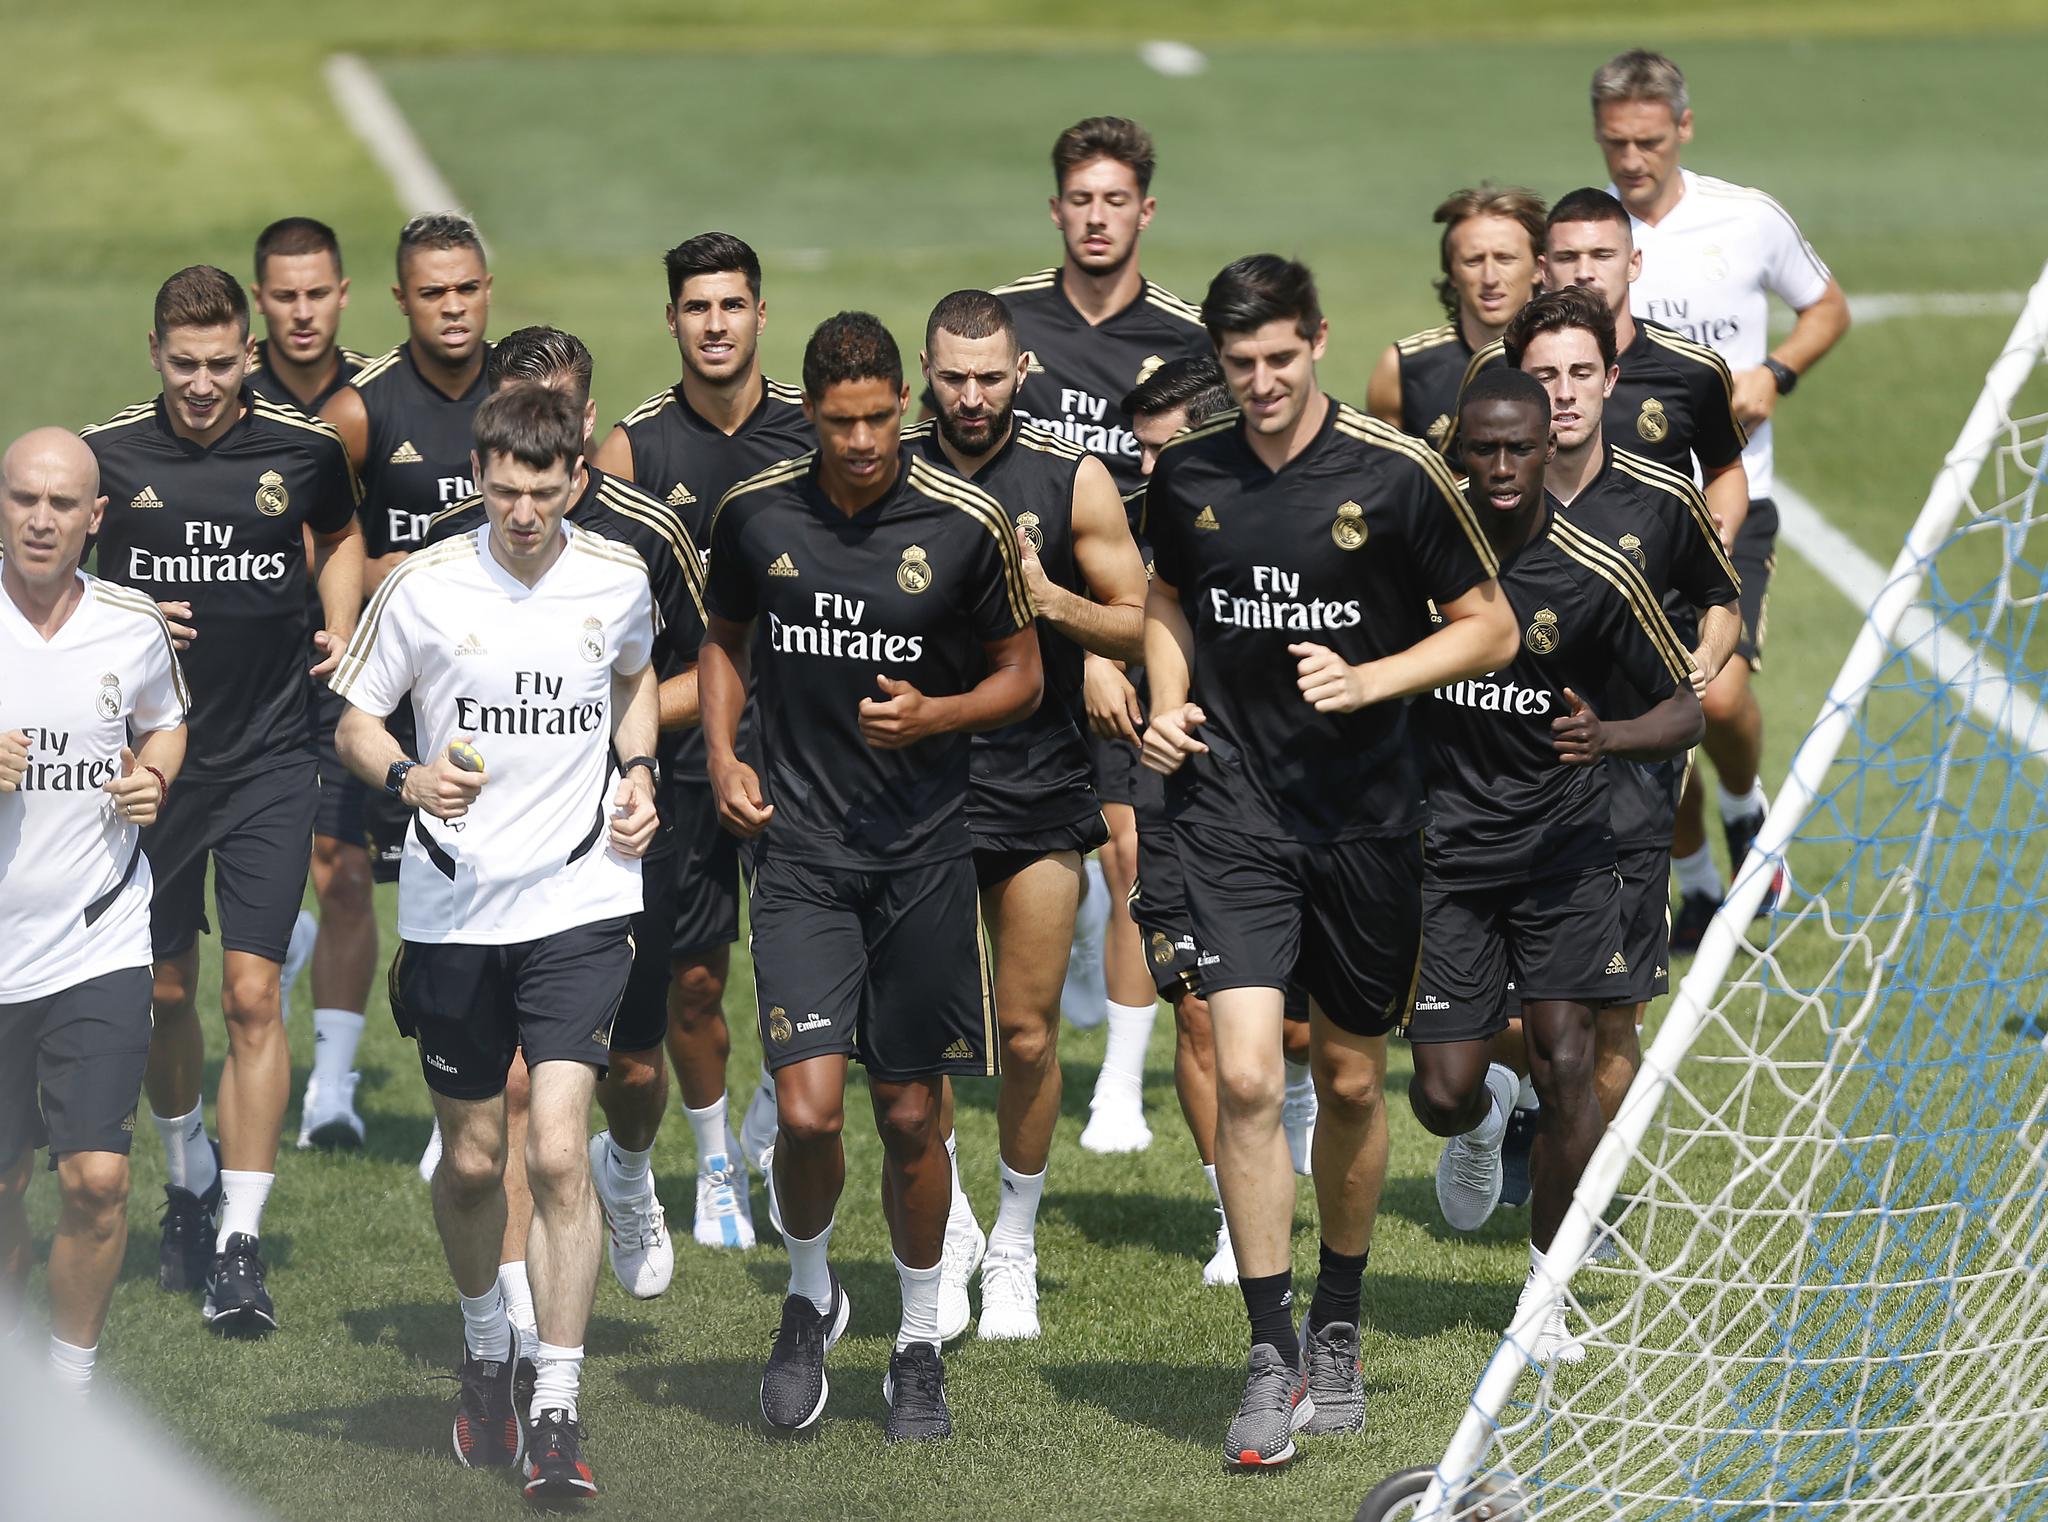 10.07.2019. Entrenamiento del Real Madrid. <HIT>Dupont</HIT>.